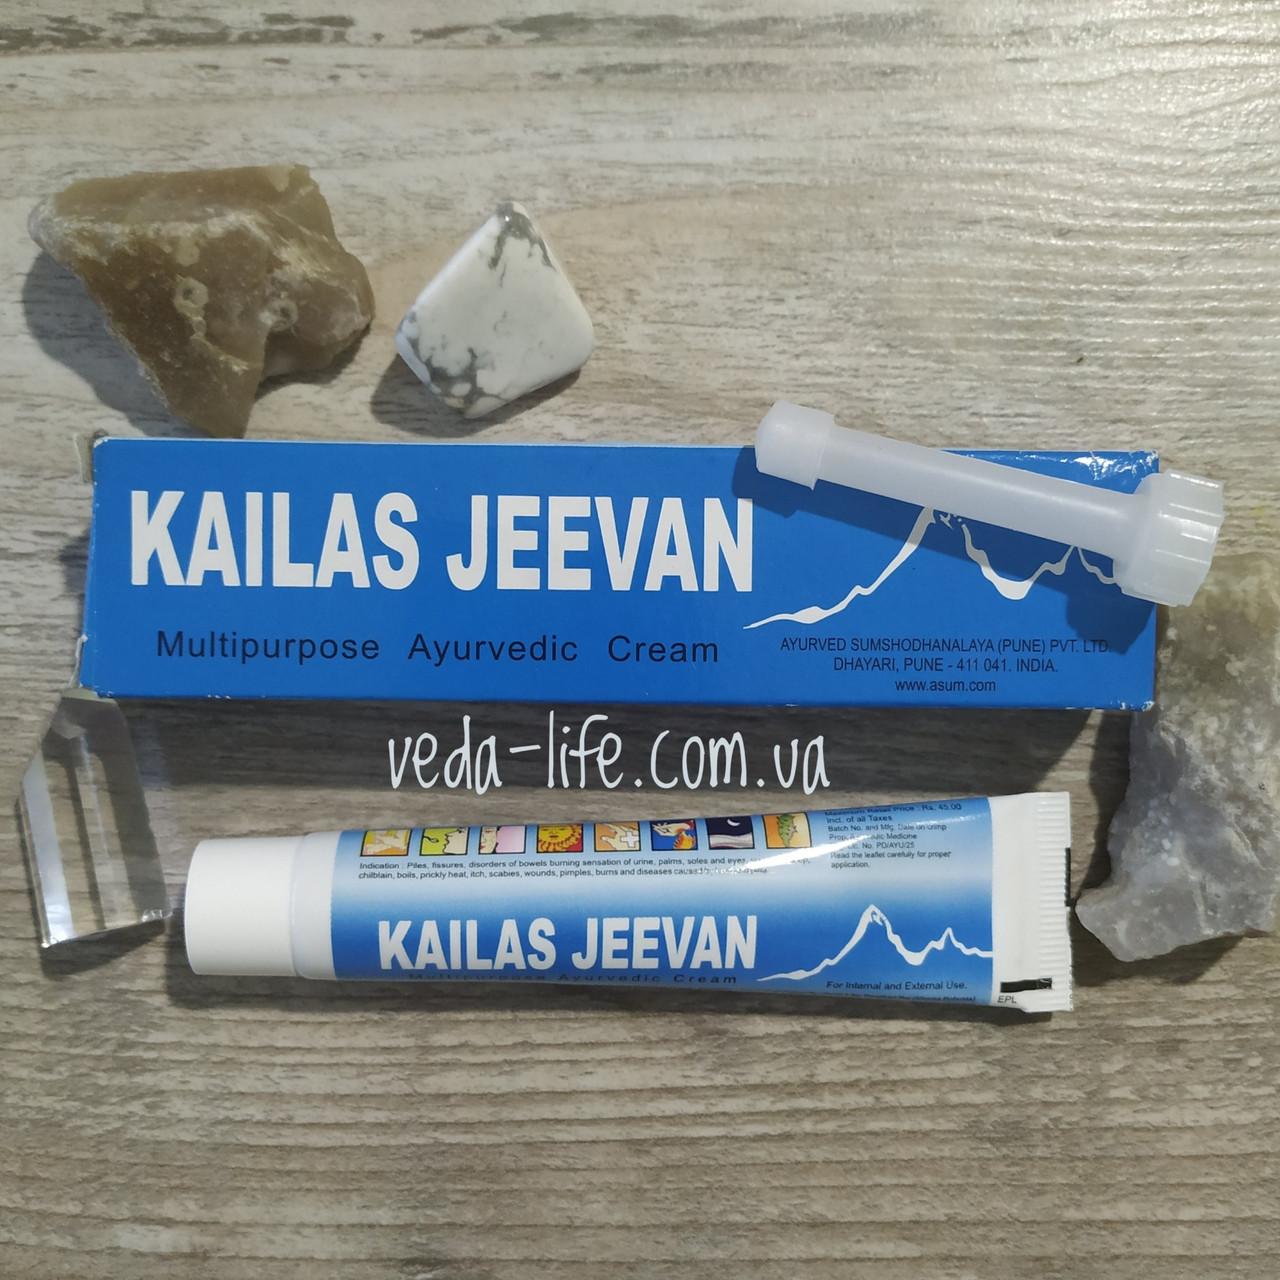 Кайлаш Дживан. Мазь-бальзам. Kailas Jeevan. 20 грамм. Фурункулы. Ожоги. Раны. Укусы насекомых. Обморожения